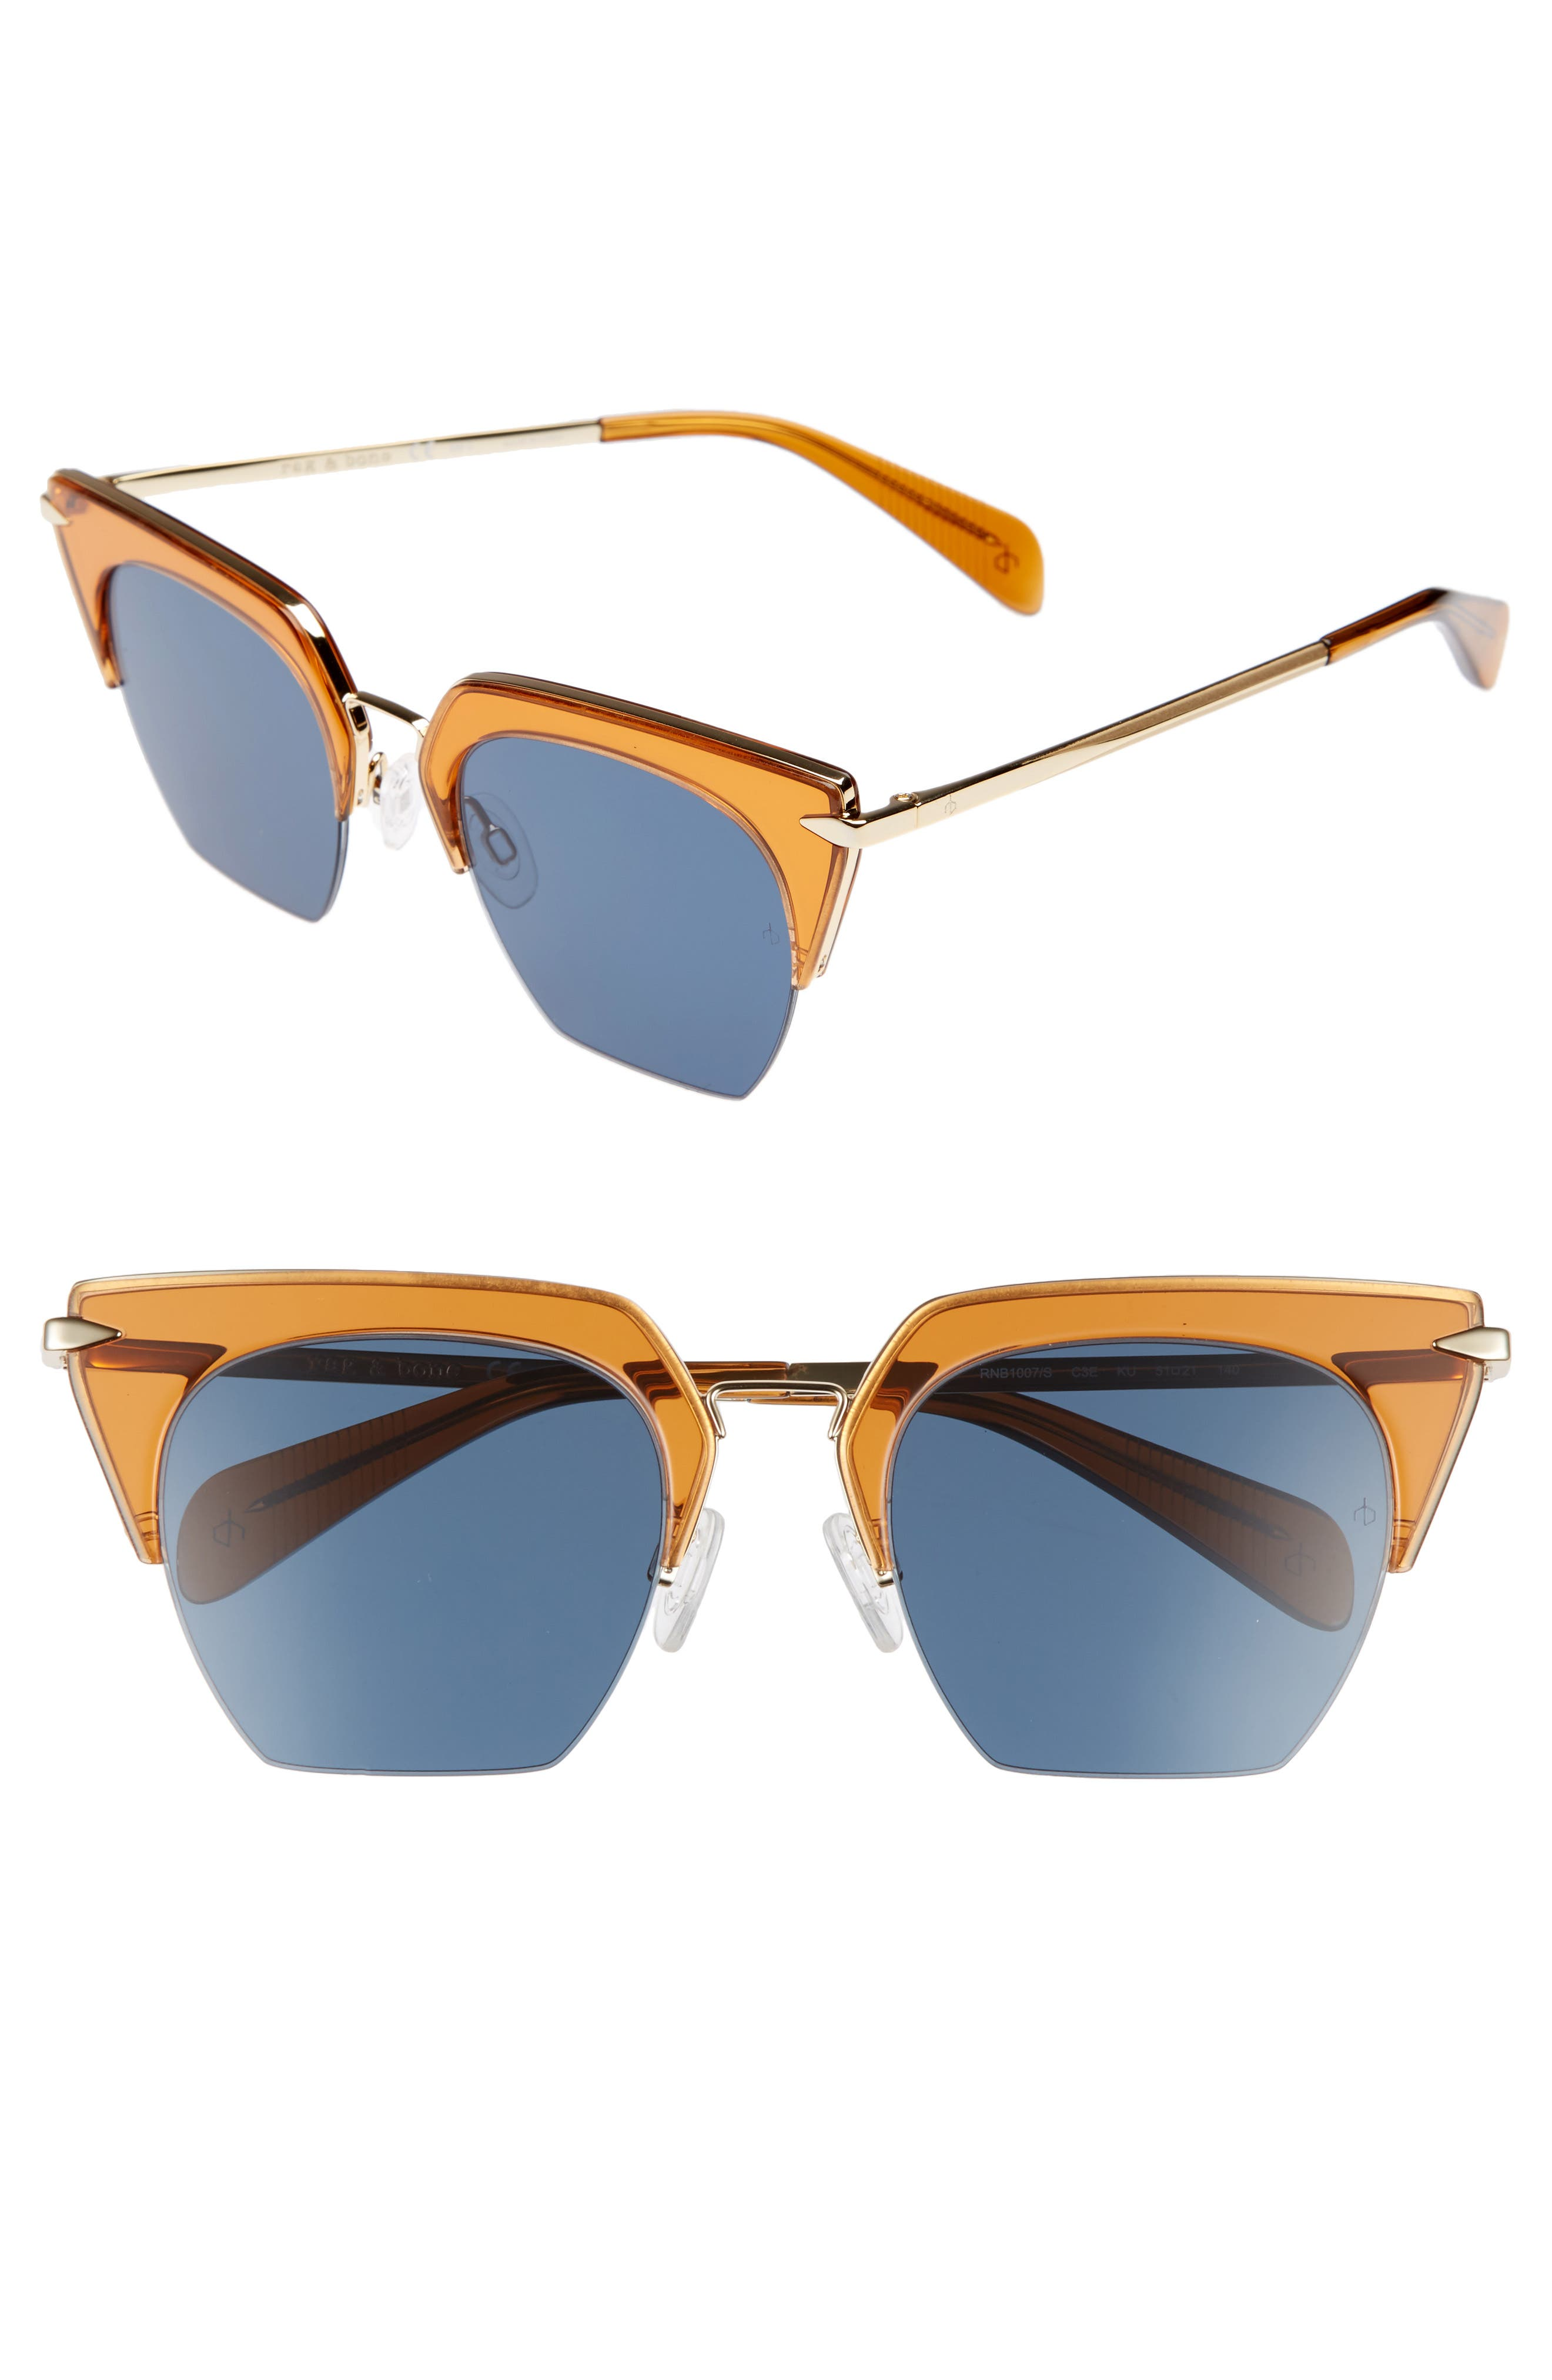 Main Image - rag & bone 51mm Cat Eye Sunglasses